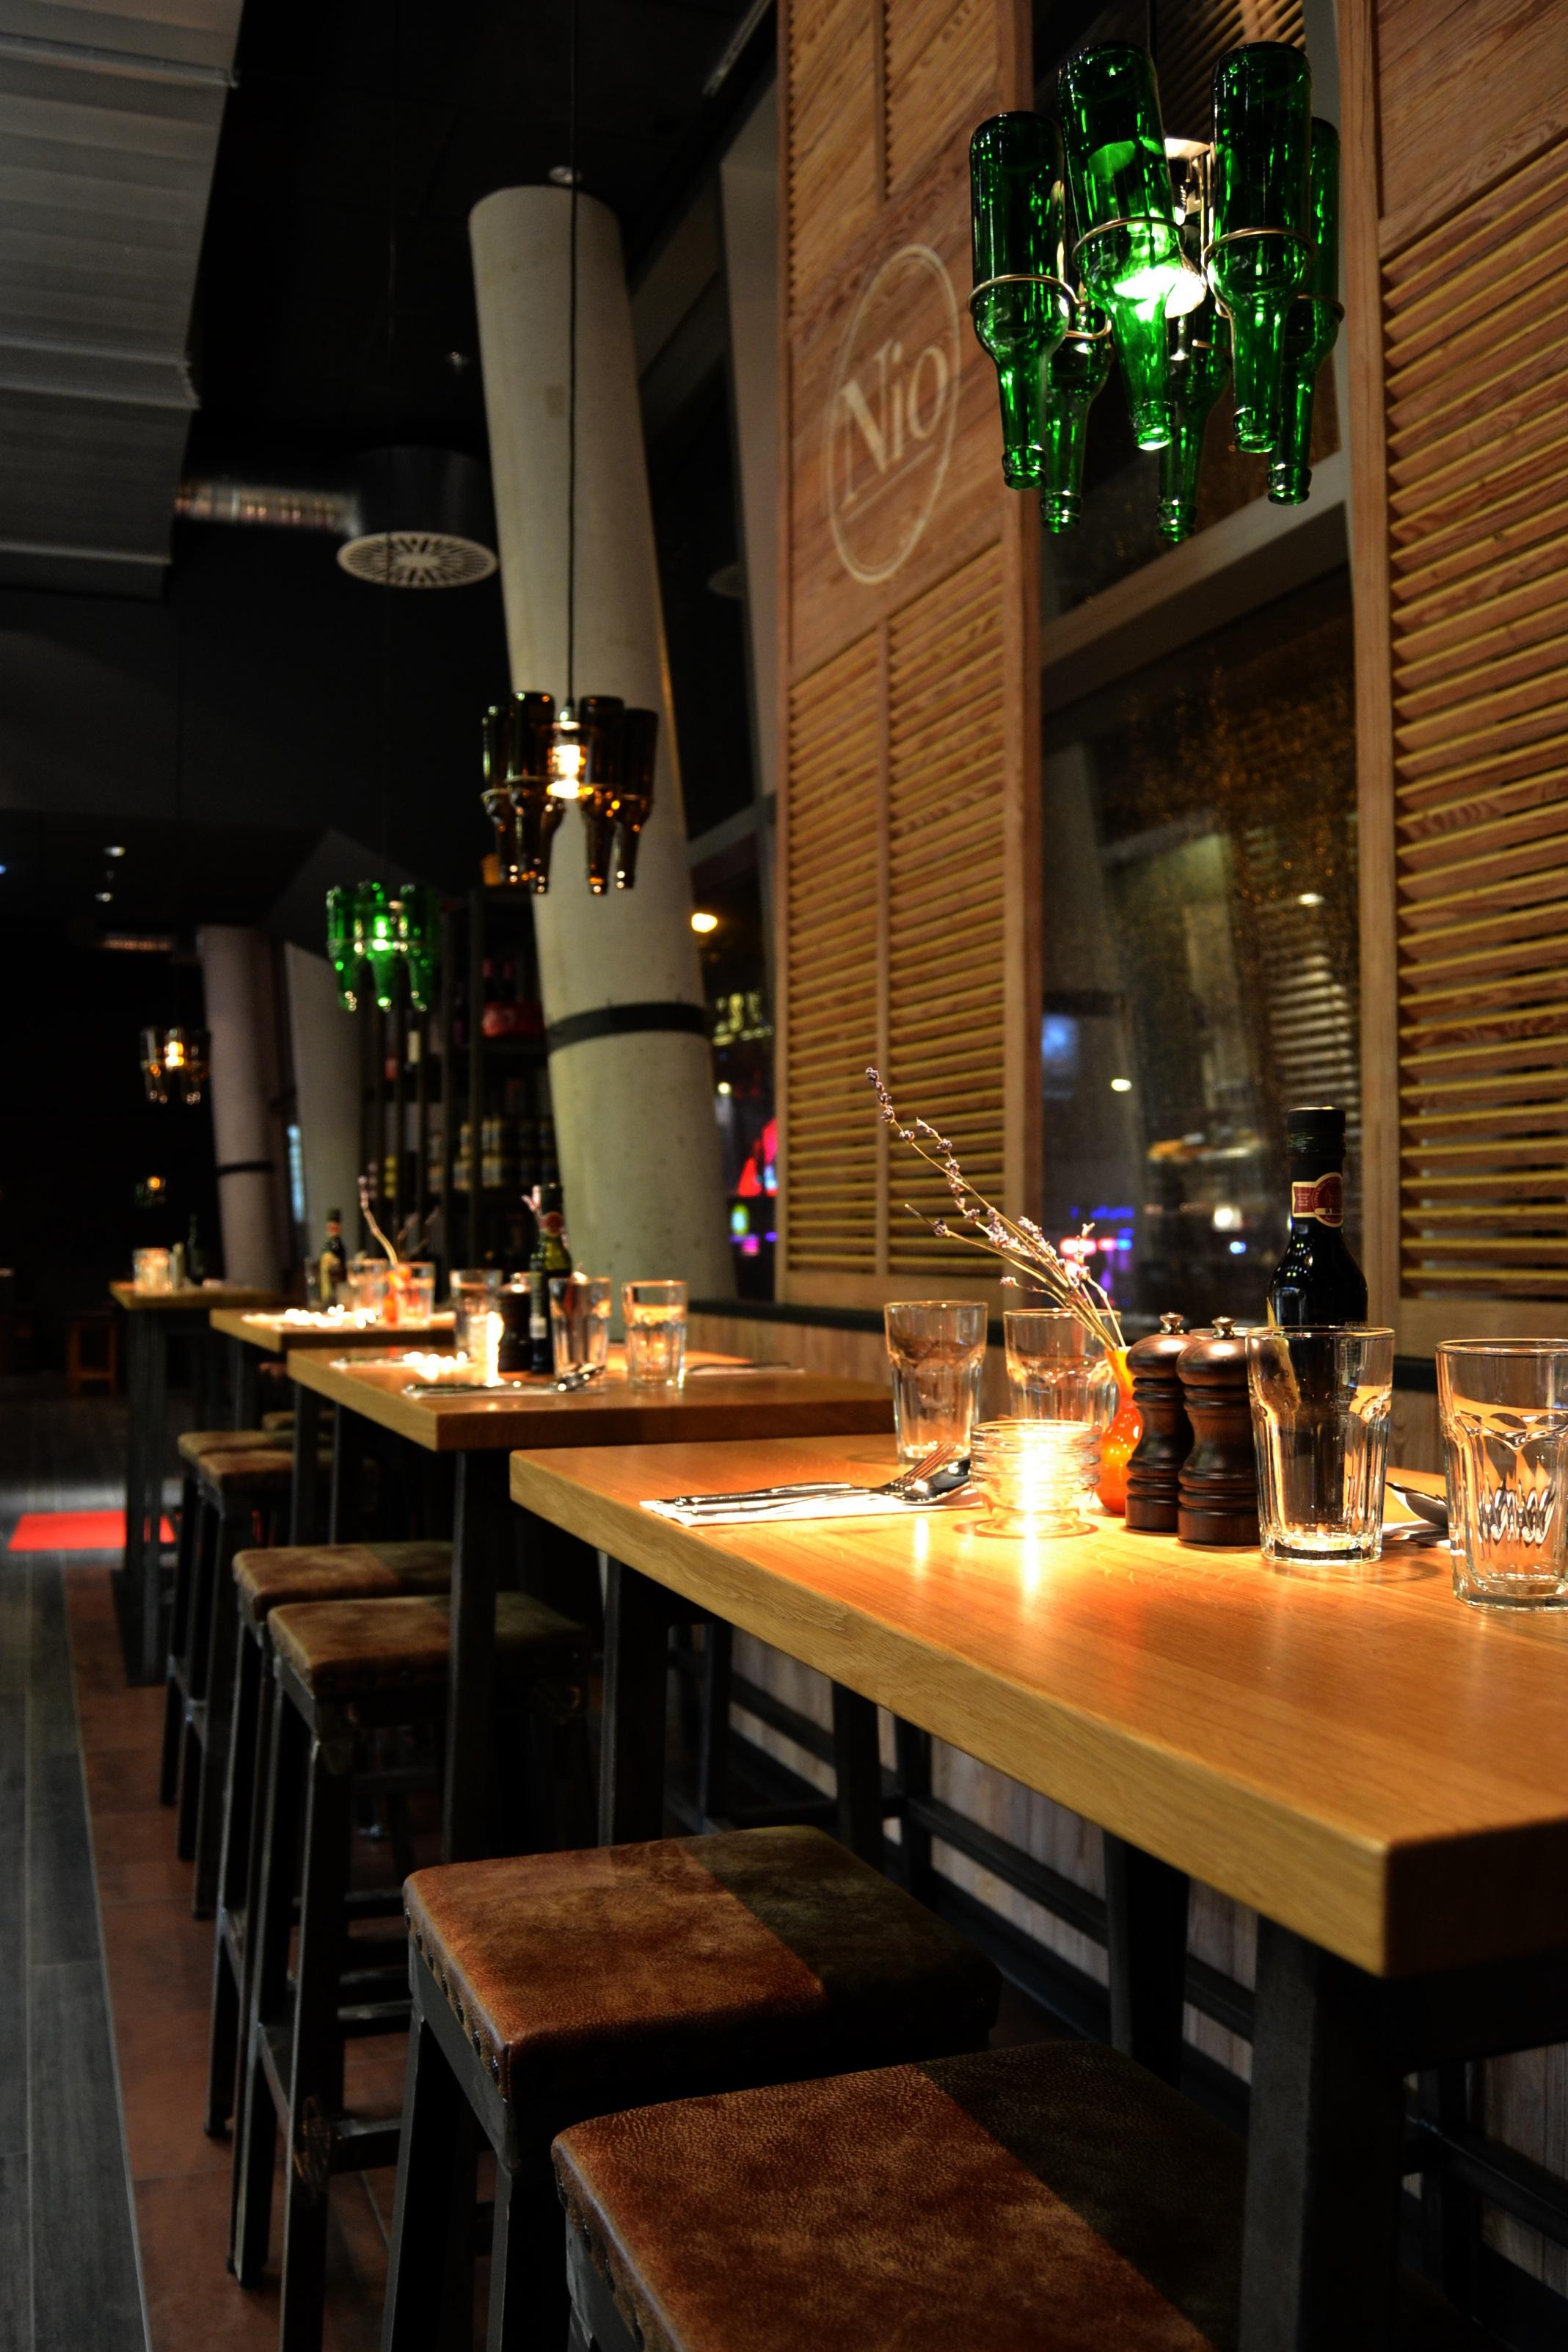 Fotos gratis cuero restaurante comida iluminaci n for Diseno de iluminacion de interiores